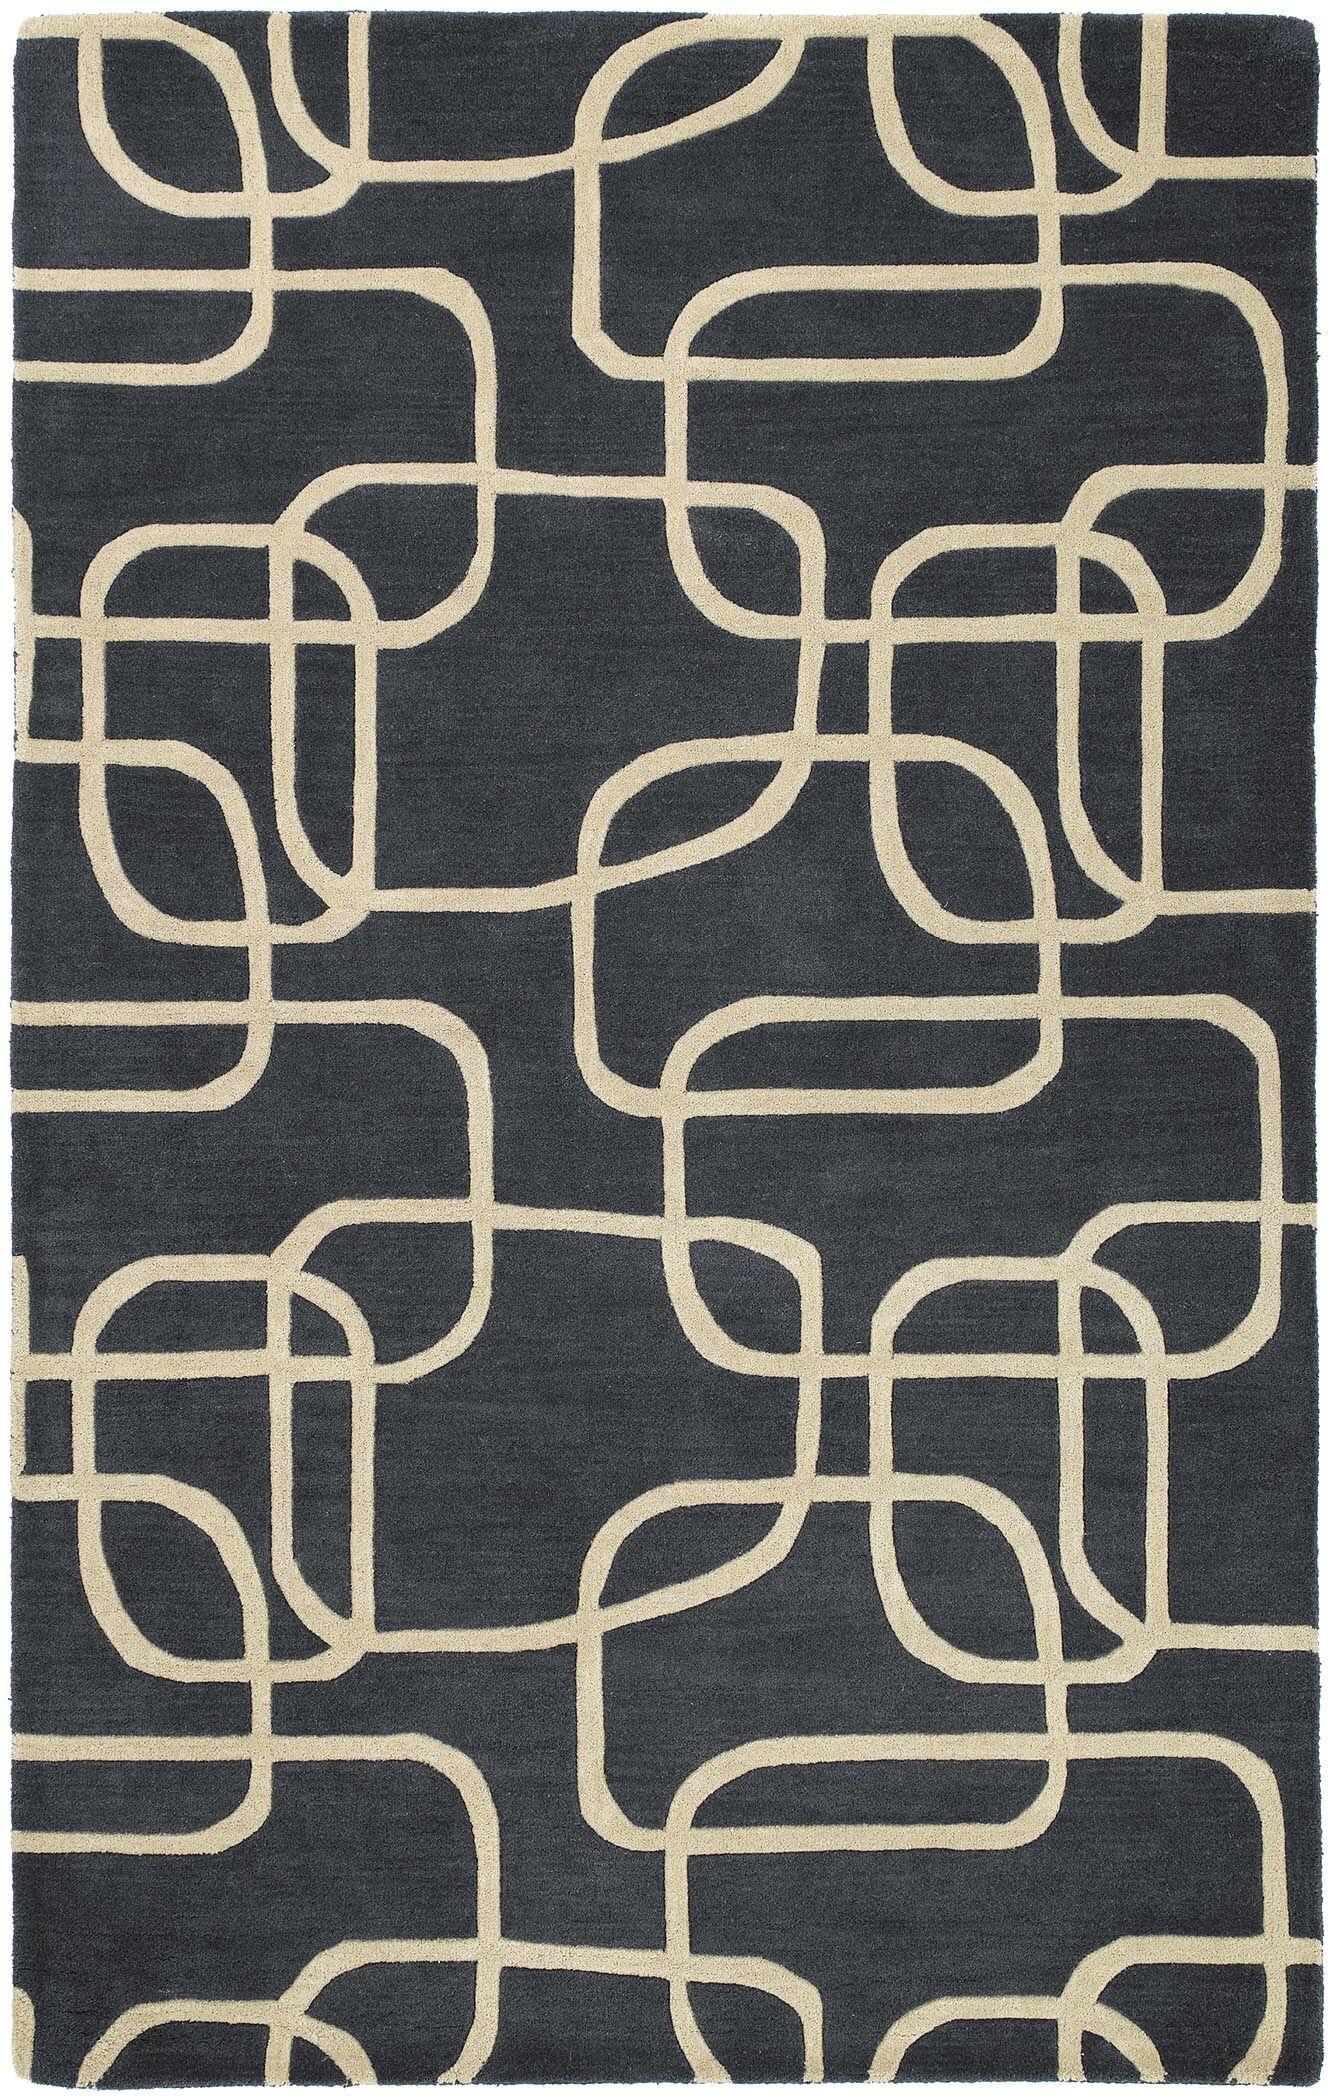 Carter Ebony Area Rug Rug Size: Rectangle 5' x 7'9